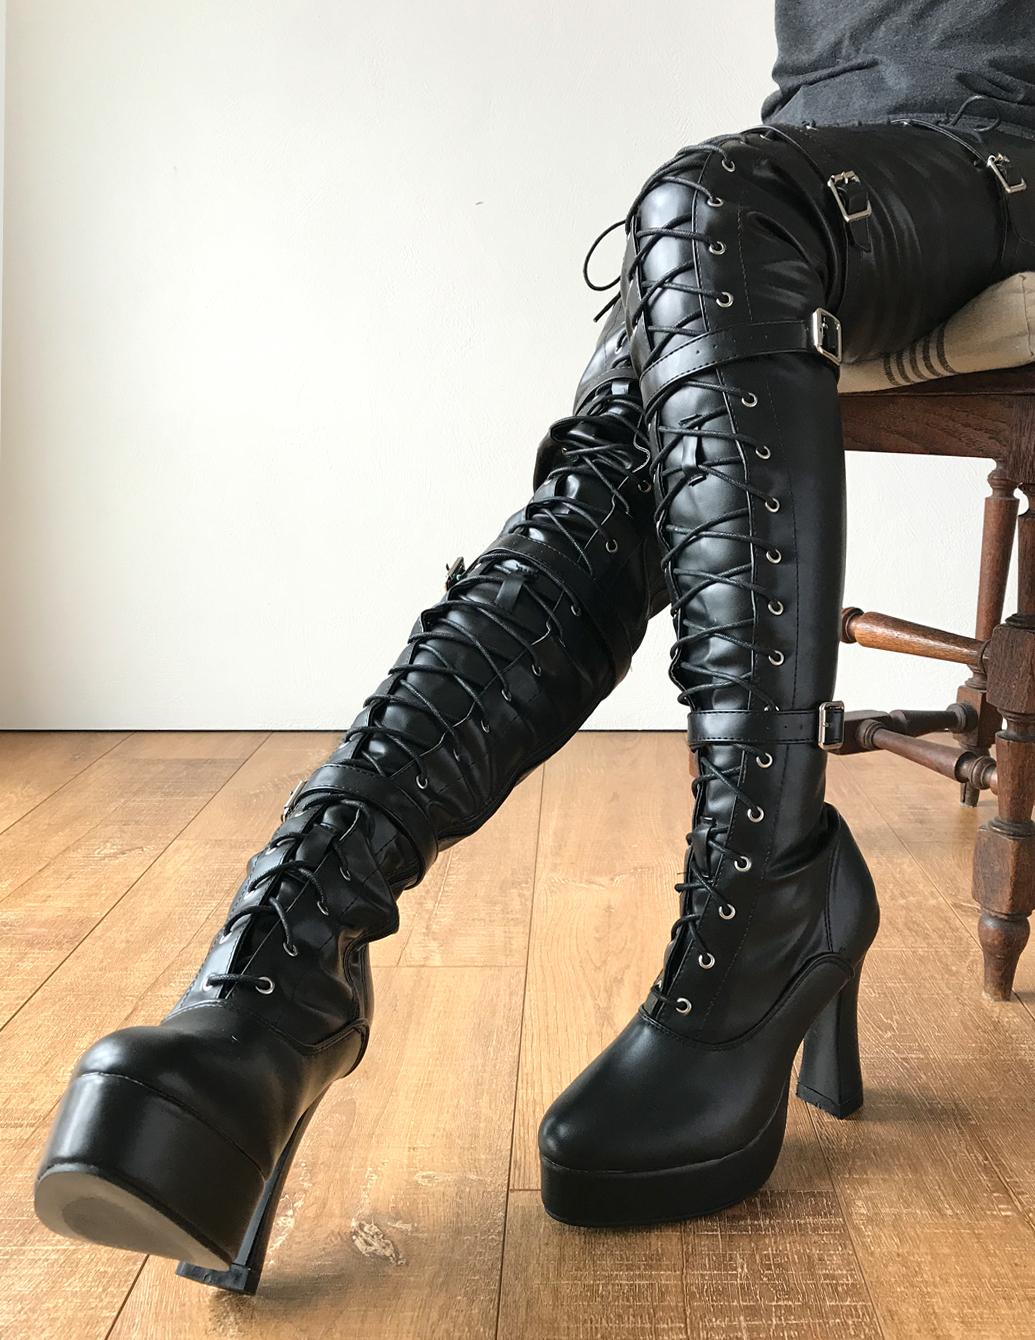 rebelsmarket_chuk_12cm_spool_heel_platform_crotch_goth_punk_pinup_cosplay_fetish_boots_boots_10.jpg